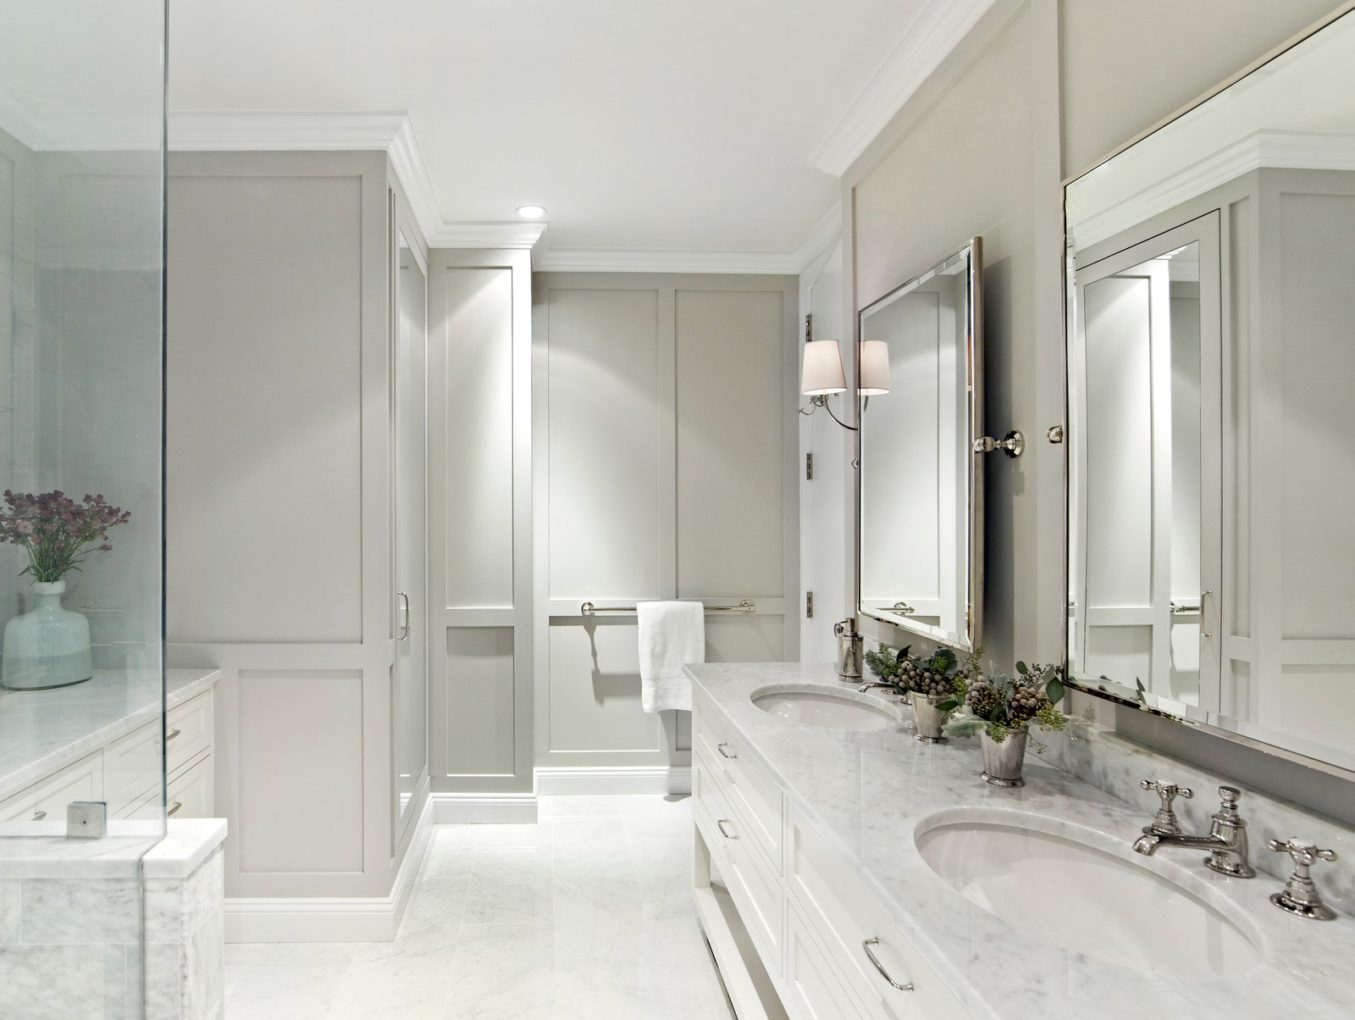 Bathroom Remodeling Contractor in Beverly Hills CA